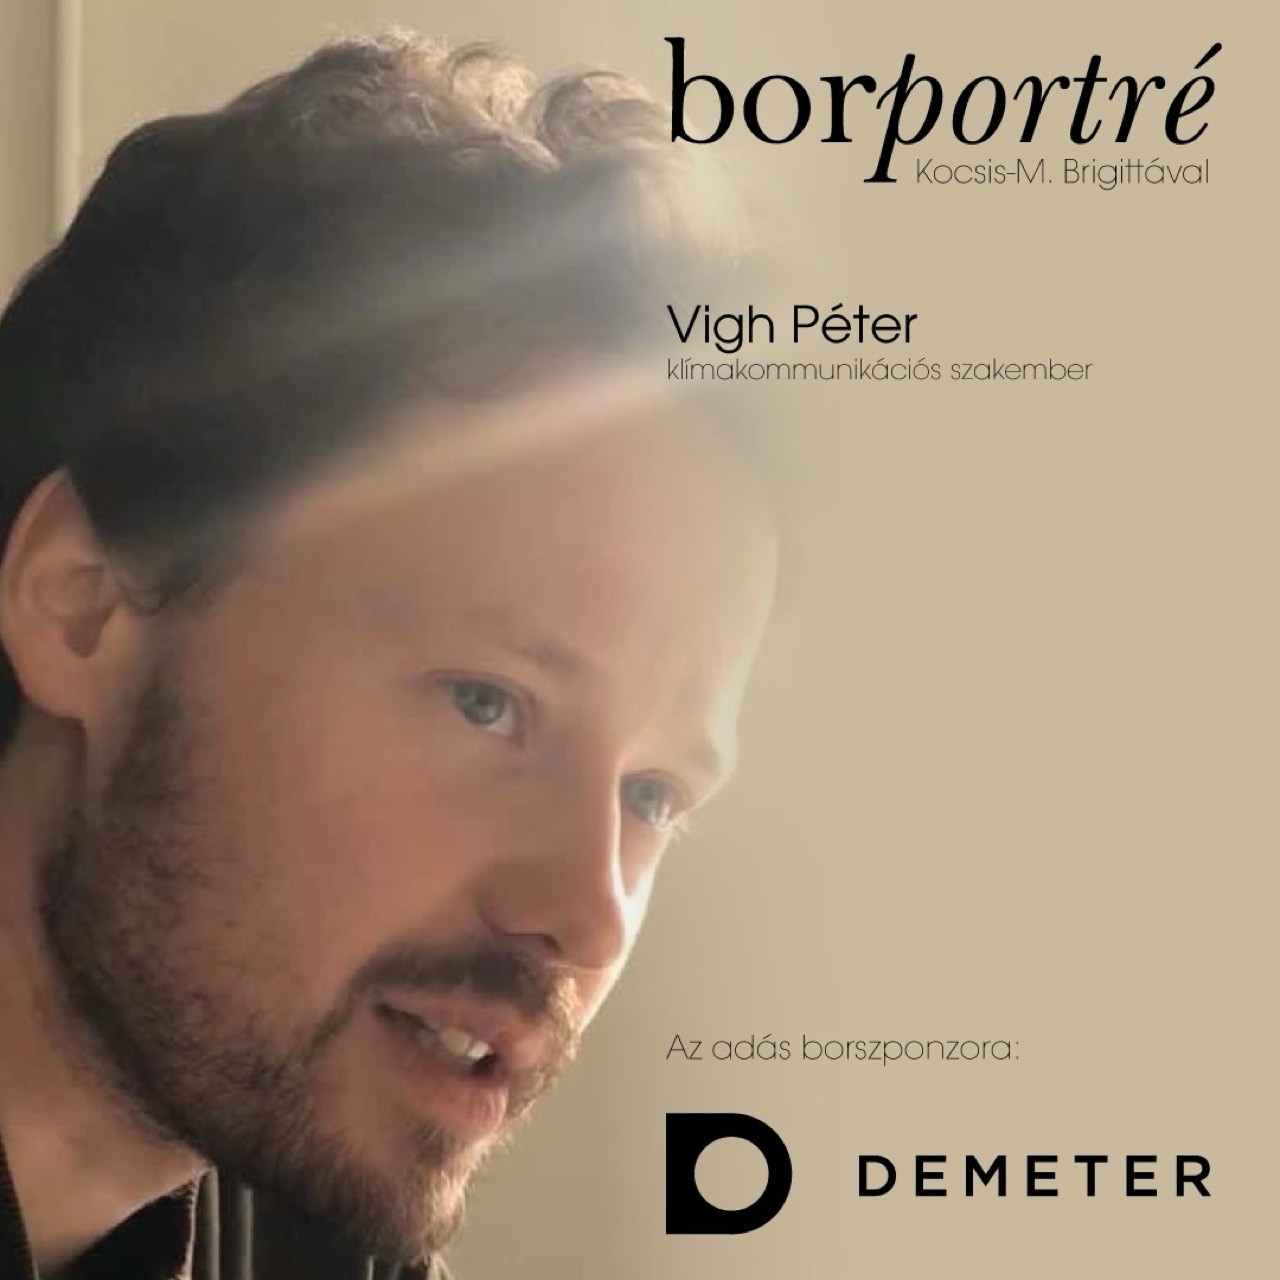 borportre_2020_08_19_vigh_peter_klima_demeter_kocka